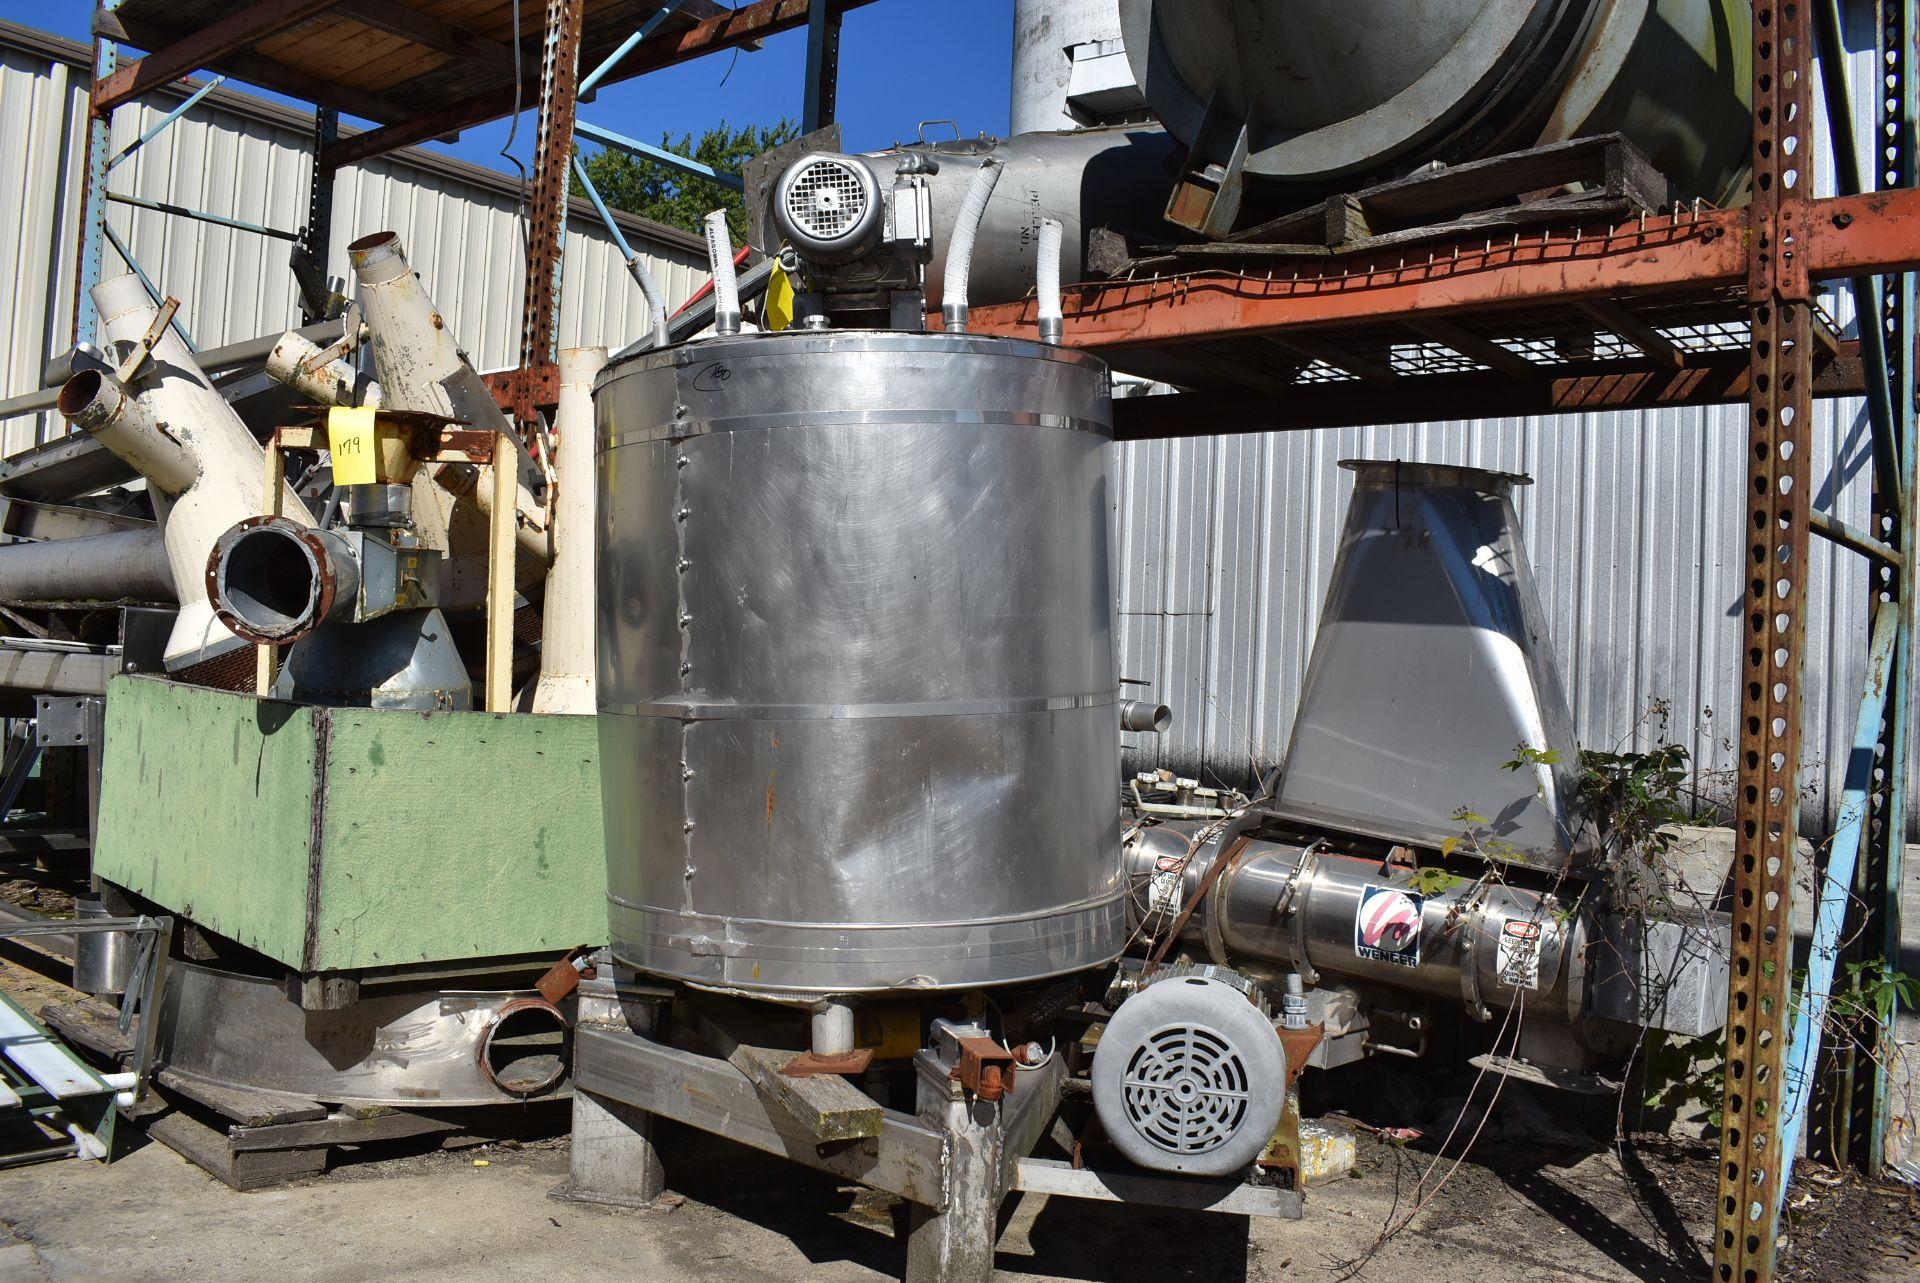 "Stainless Steel Tank, 30"" Diameter x 36"" Top - Flat Bottom, 3 HP Motor & Pump, Includes Mixer - Image 3 of 3"